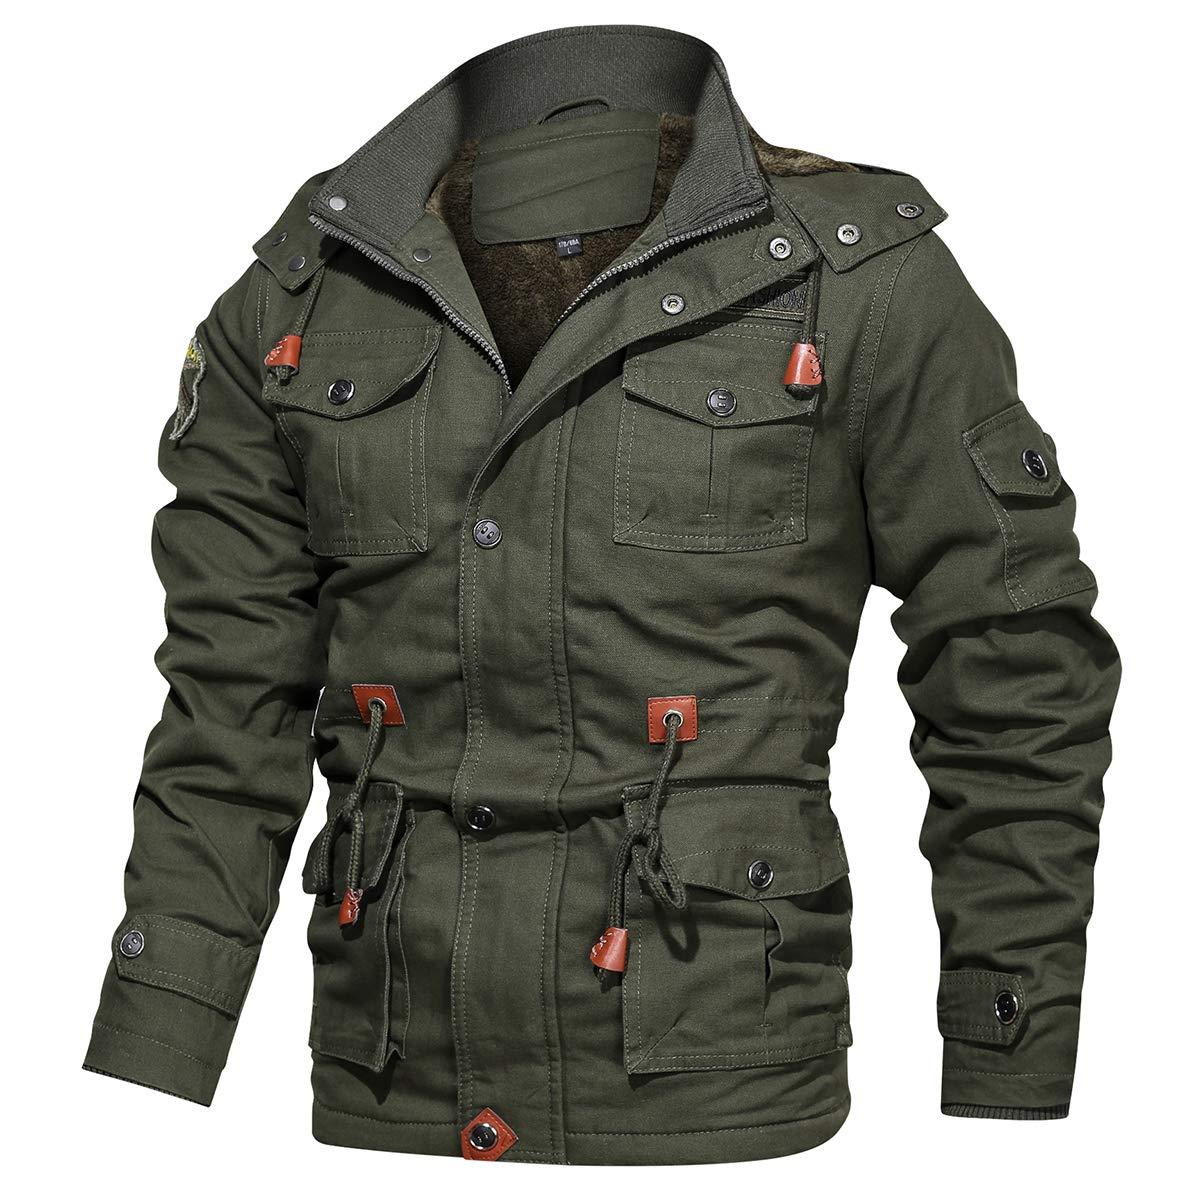 ReFire Gear Men's Winter Warm Military Jacket Thicken Windbreaker Cotton Cargo Parka Coat with Removable Hood by ReFire Gear